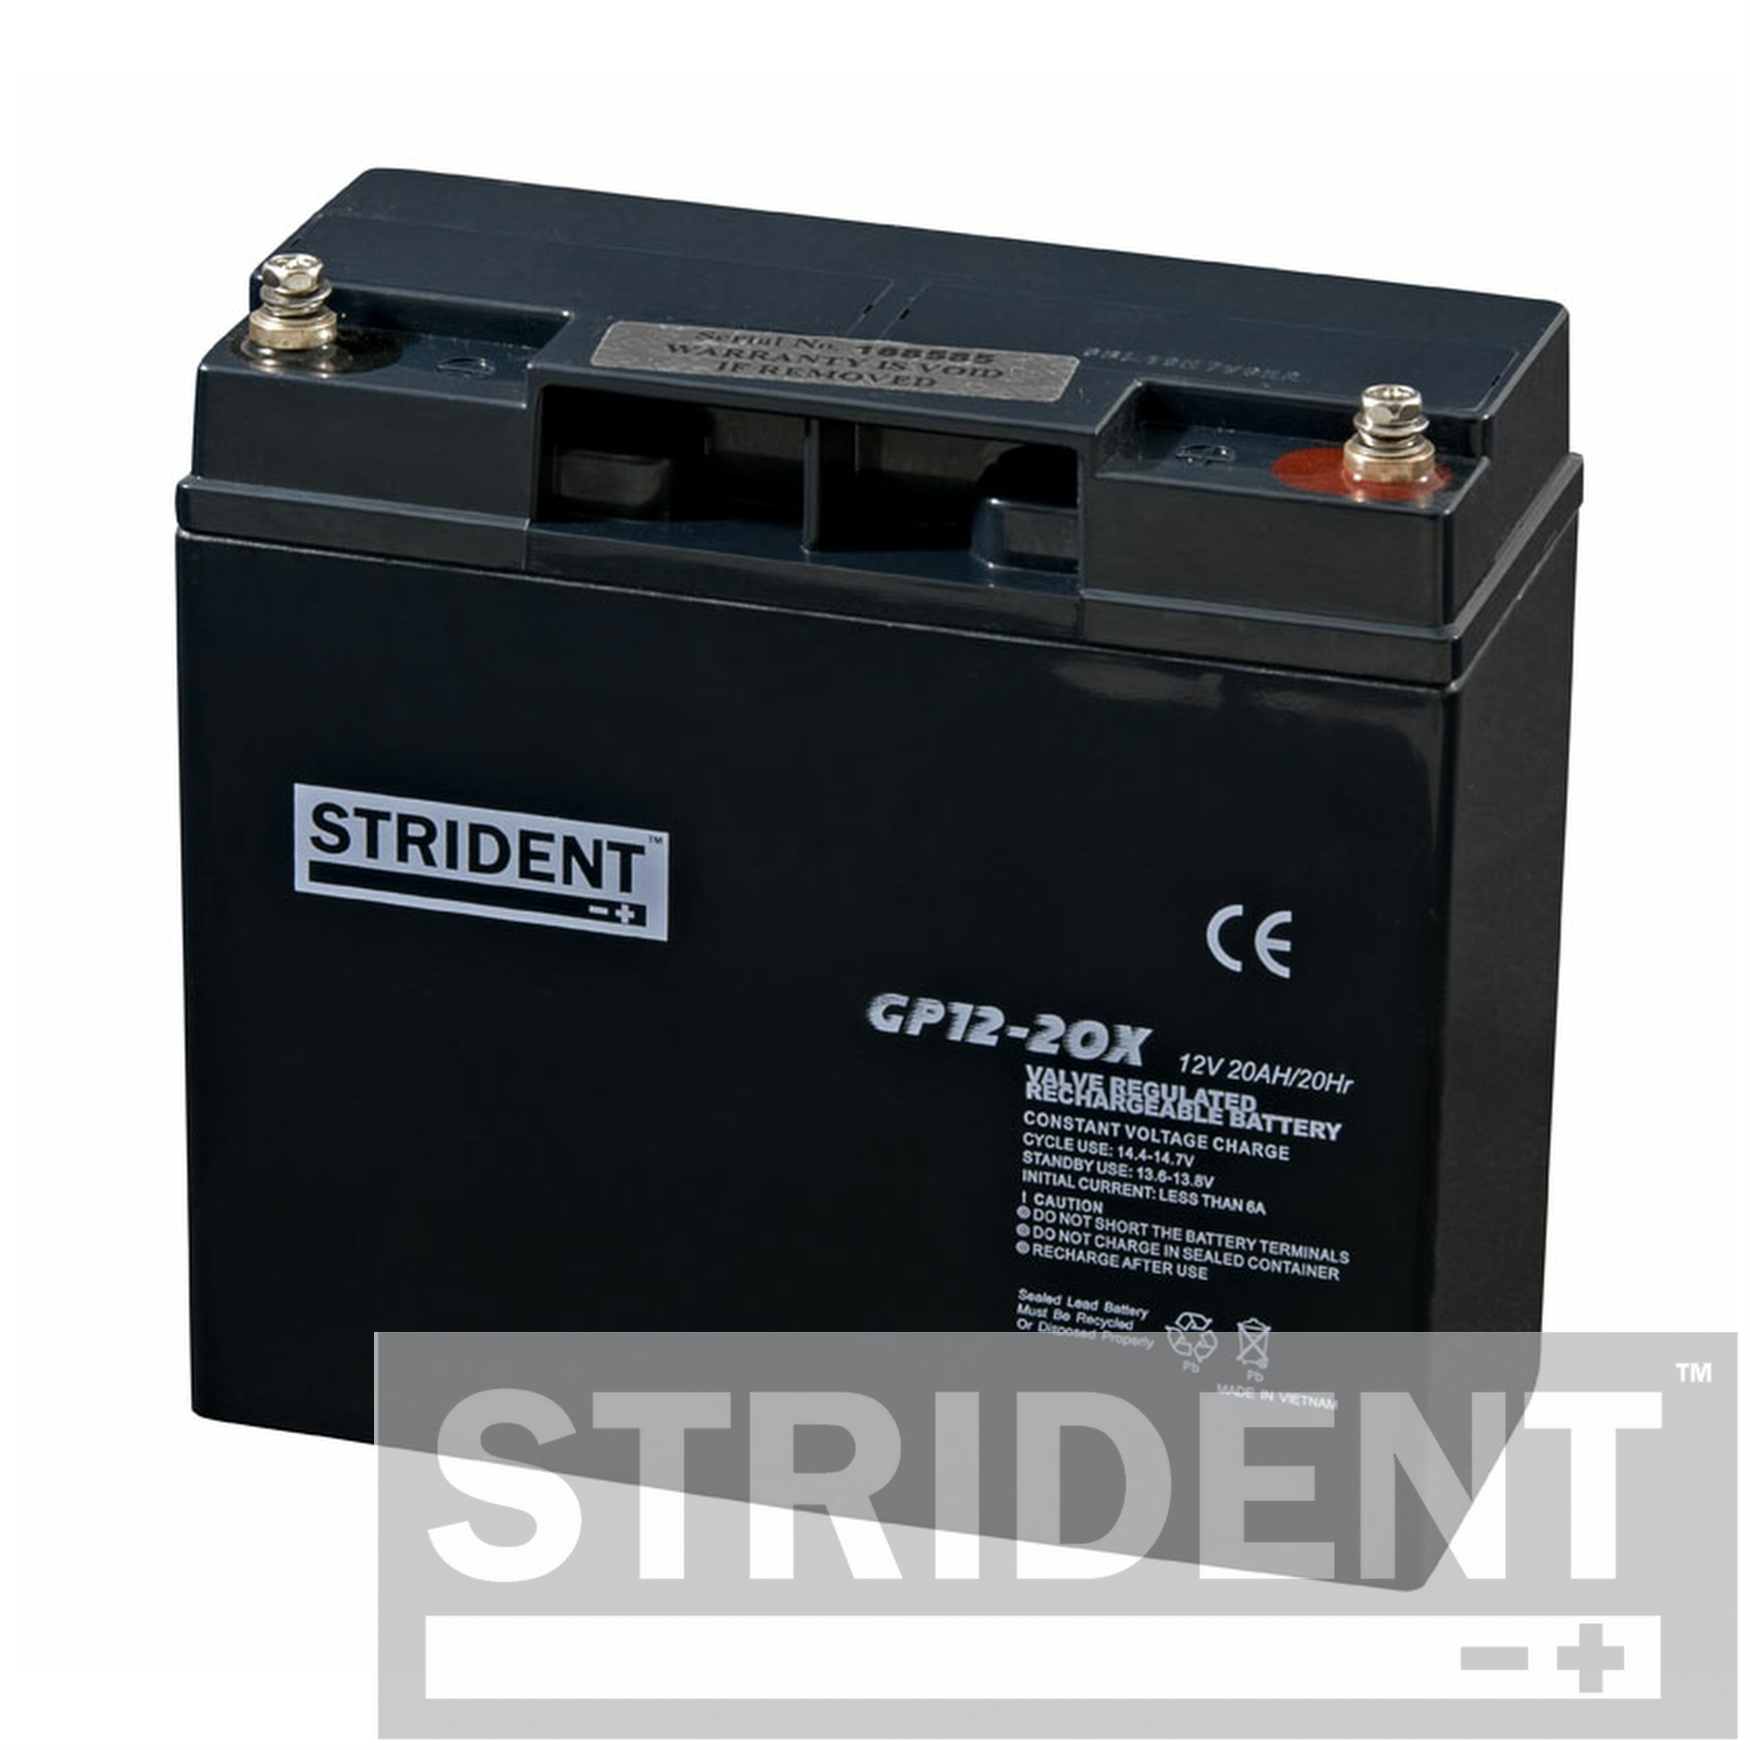 strident-agm-battery-gp12-20.jpg